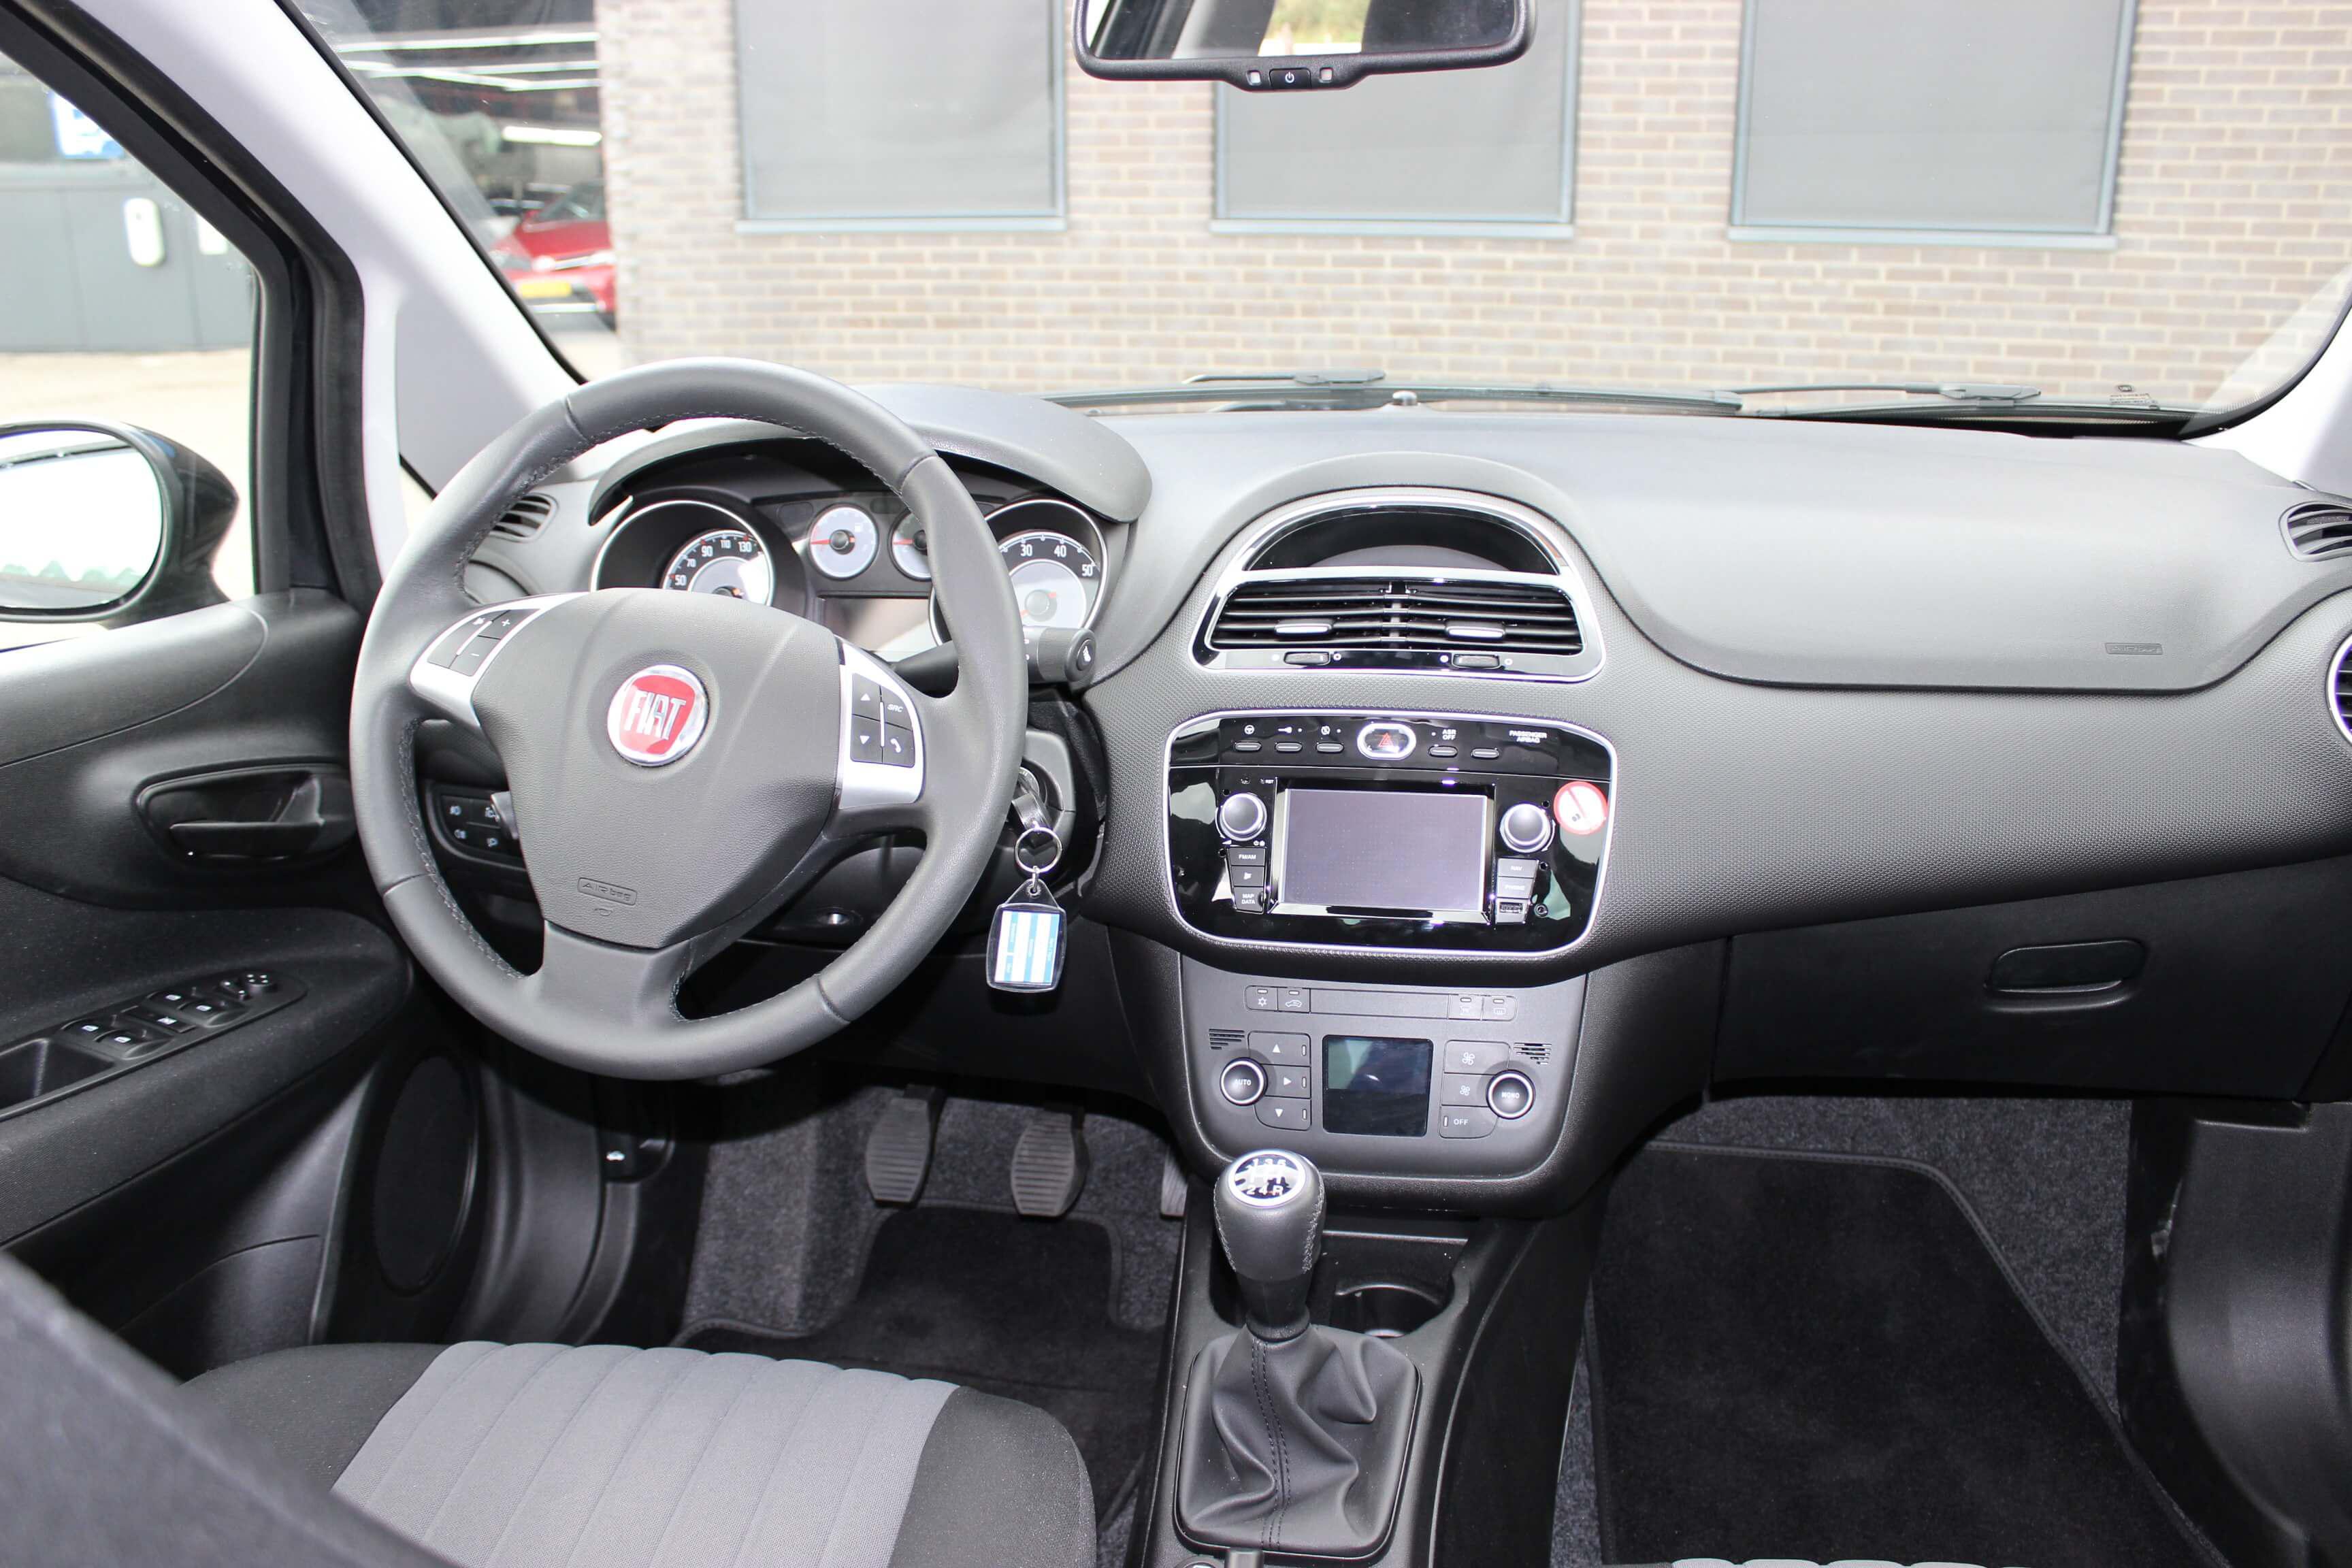 Fiat Punto Evo binnenkant 1